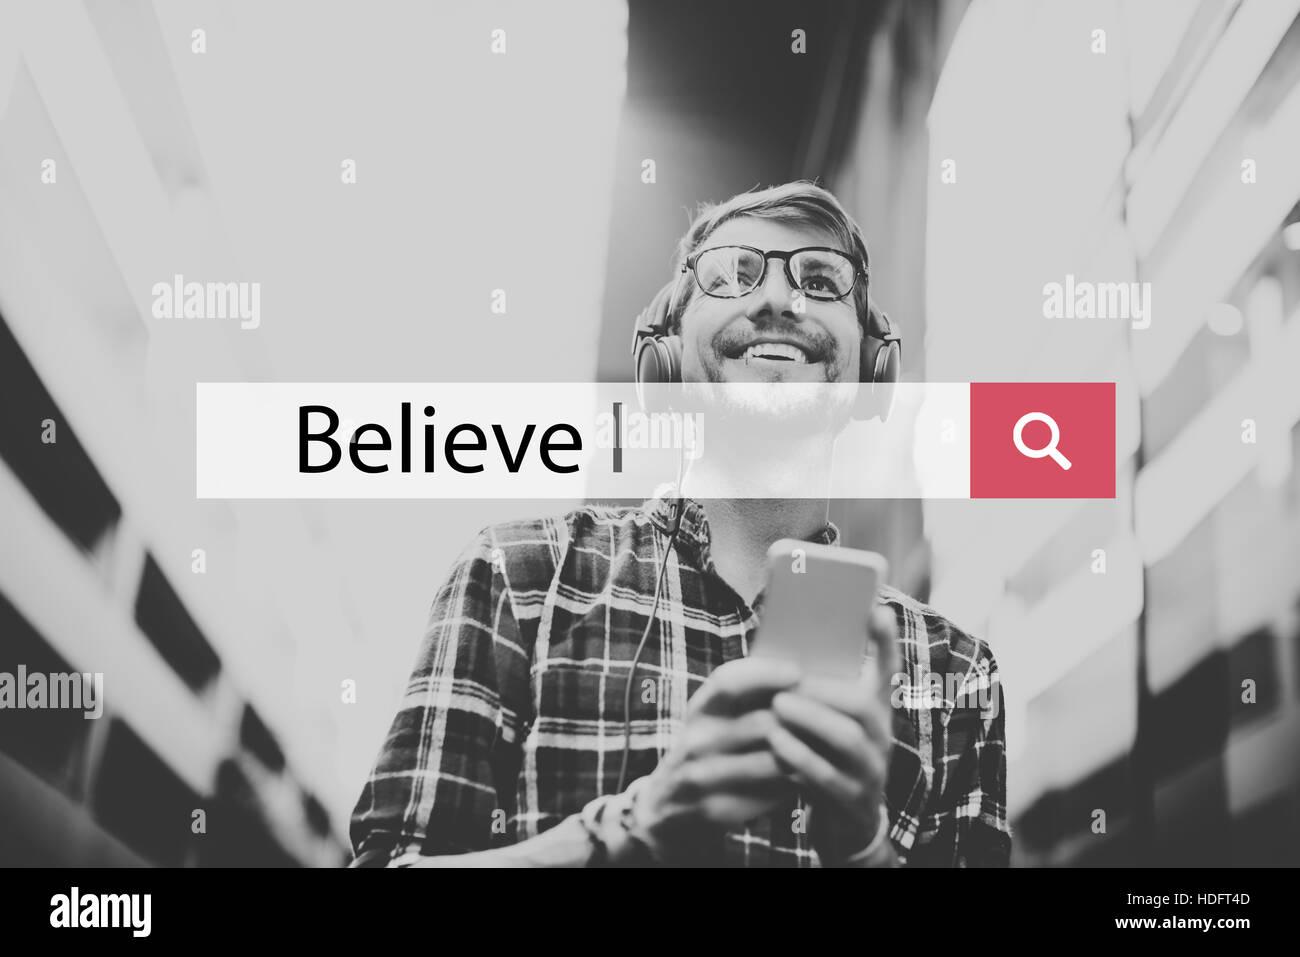 Believe Trust Faith Hope Concept Photo Stock